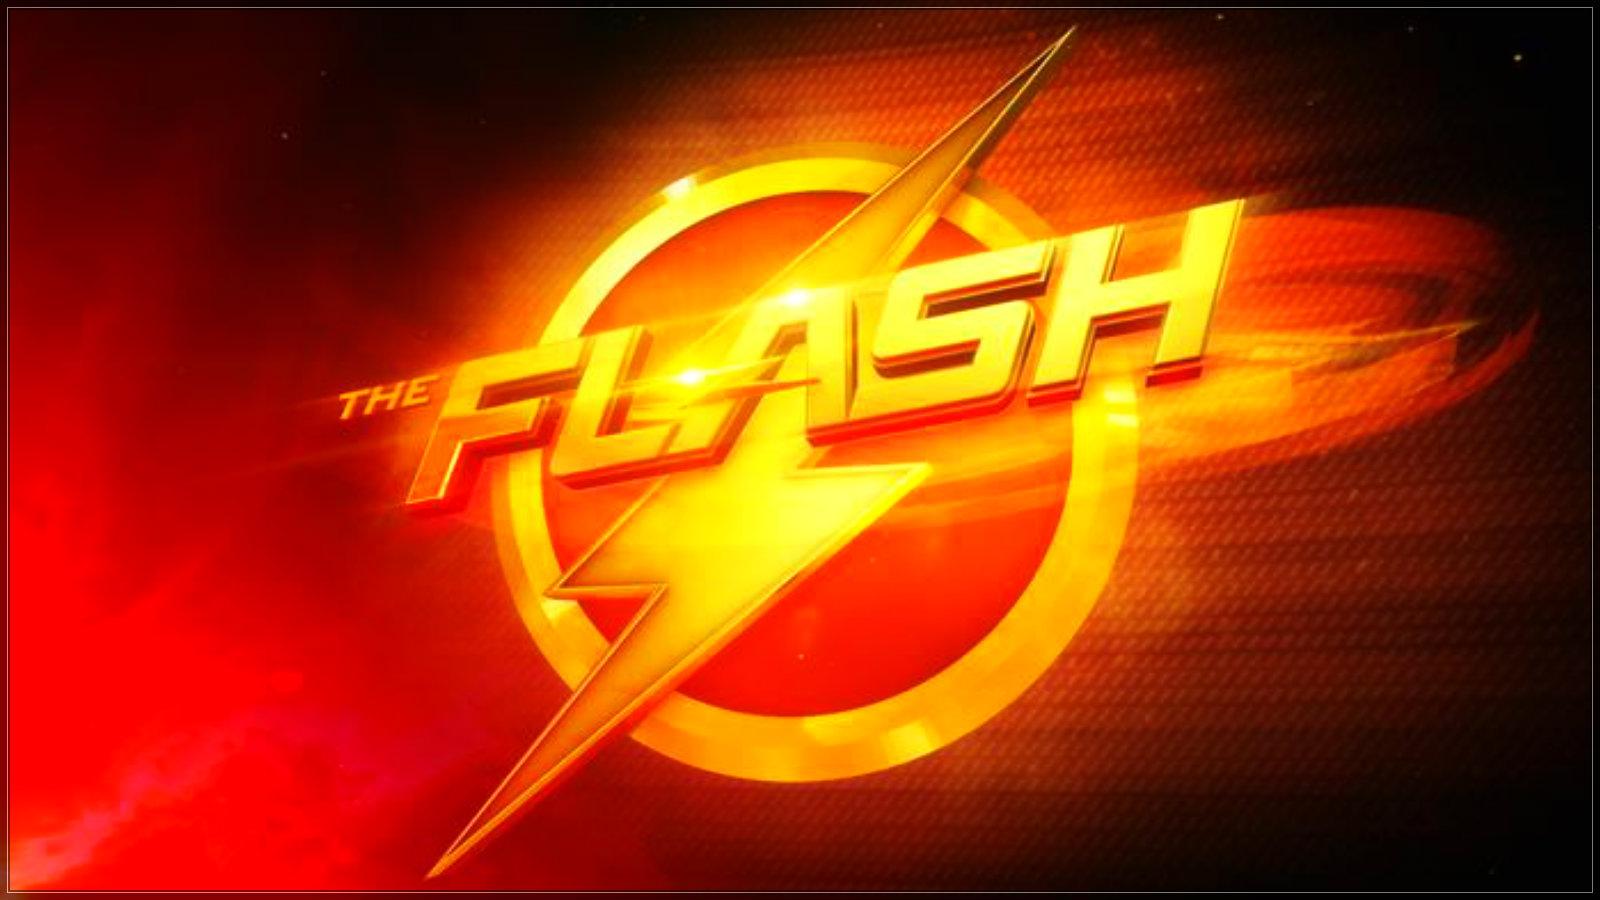 The Flash CW The Flash by fanpopcom 1600x900